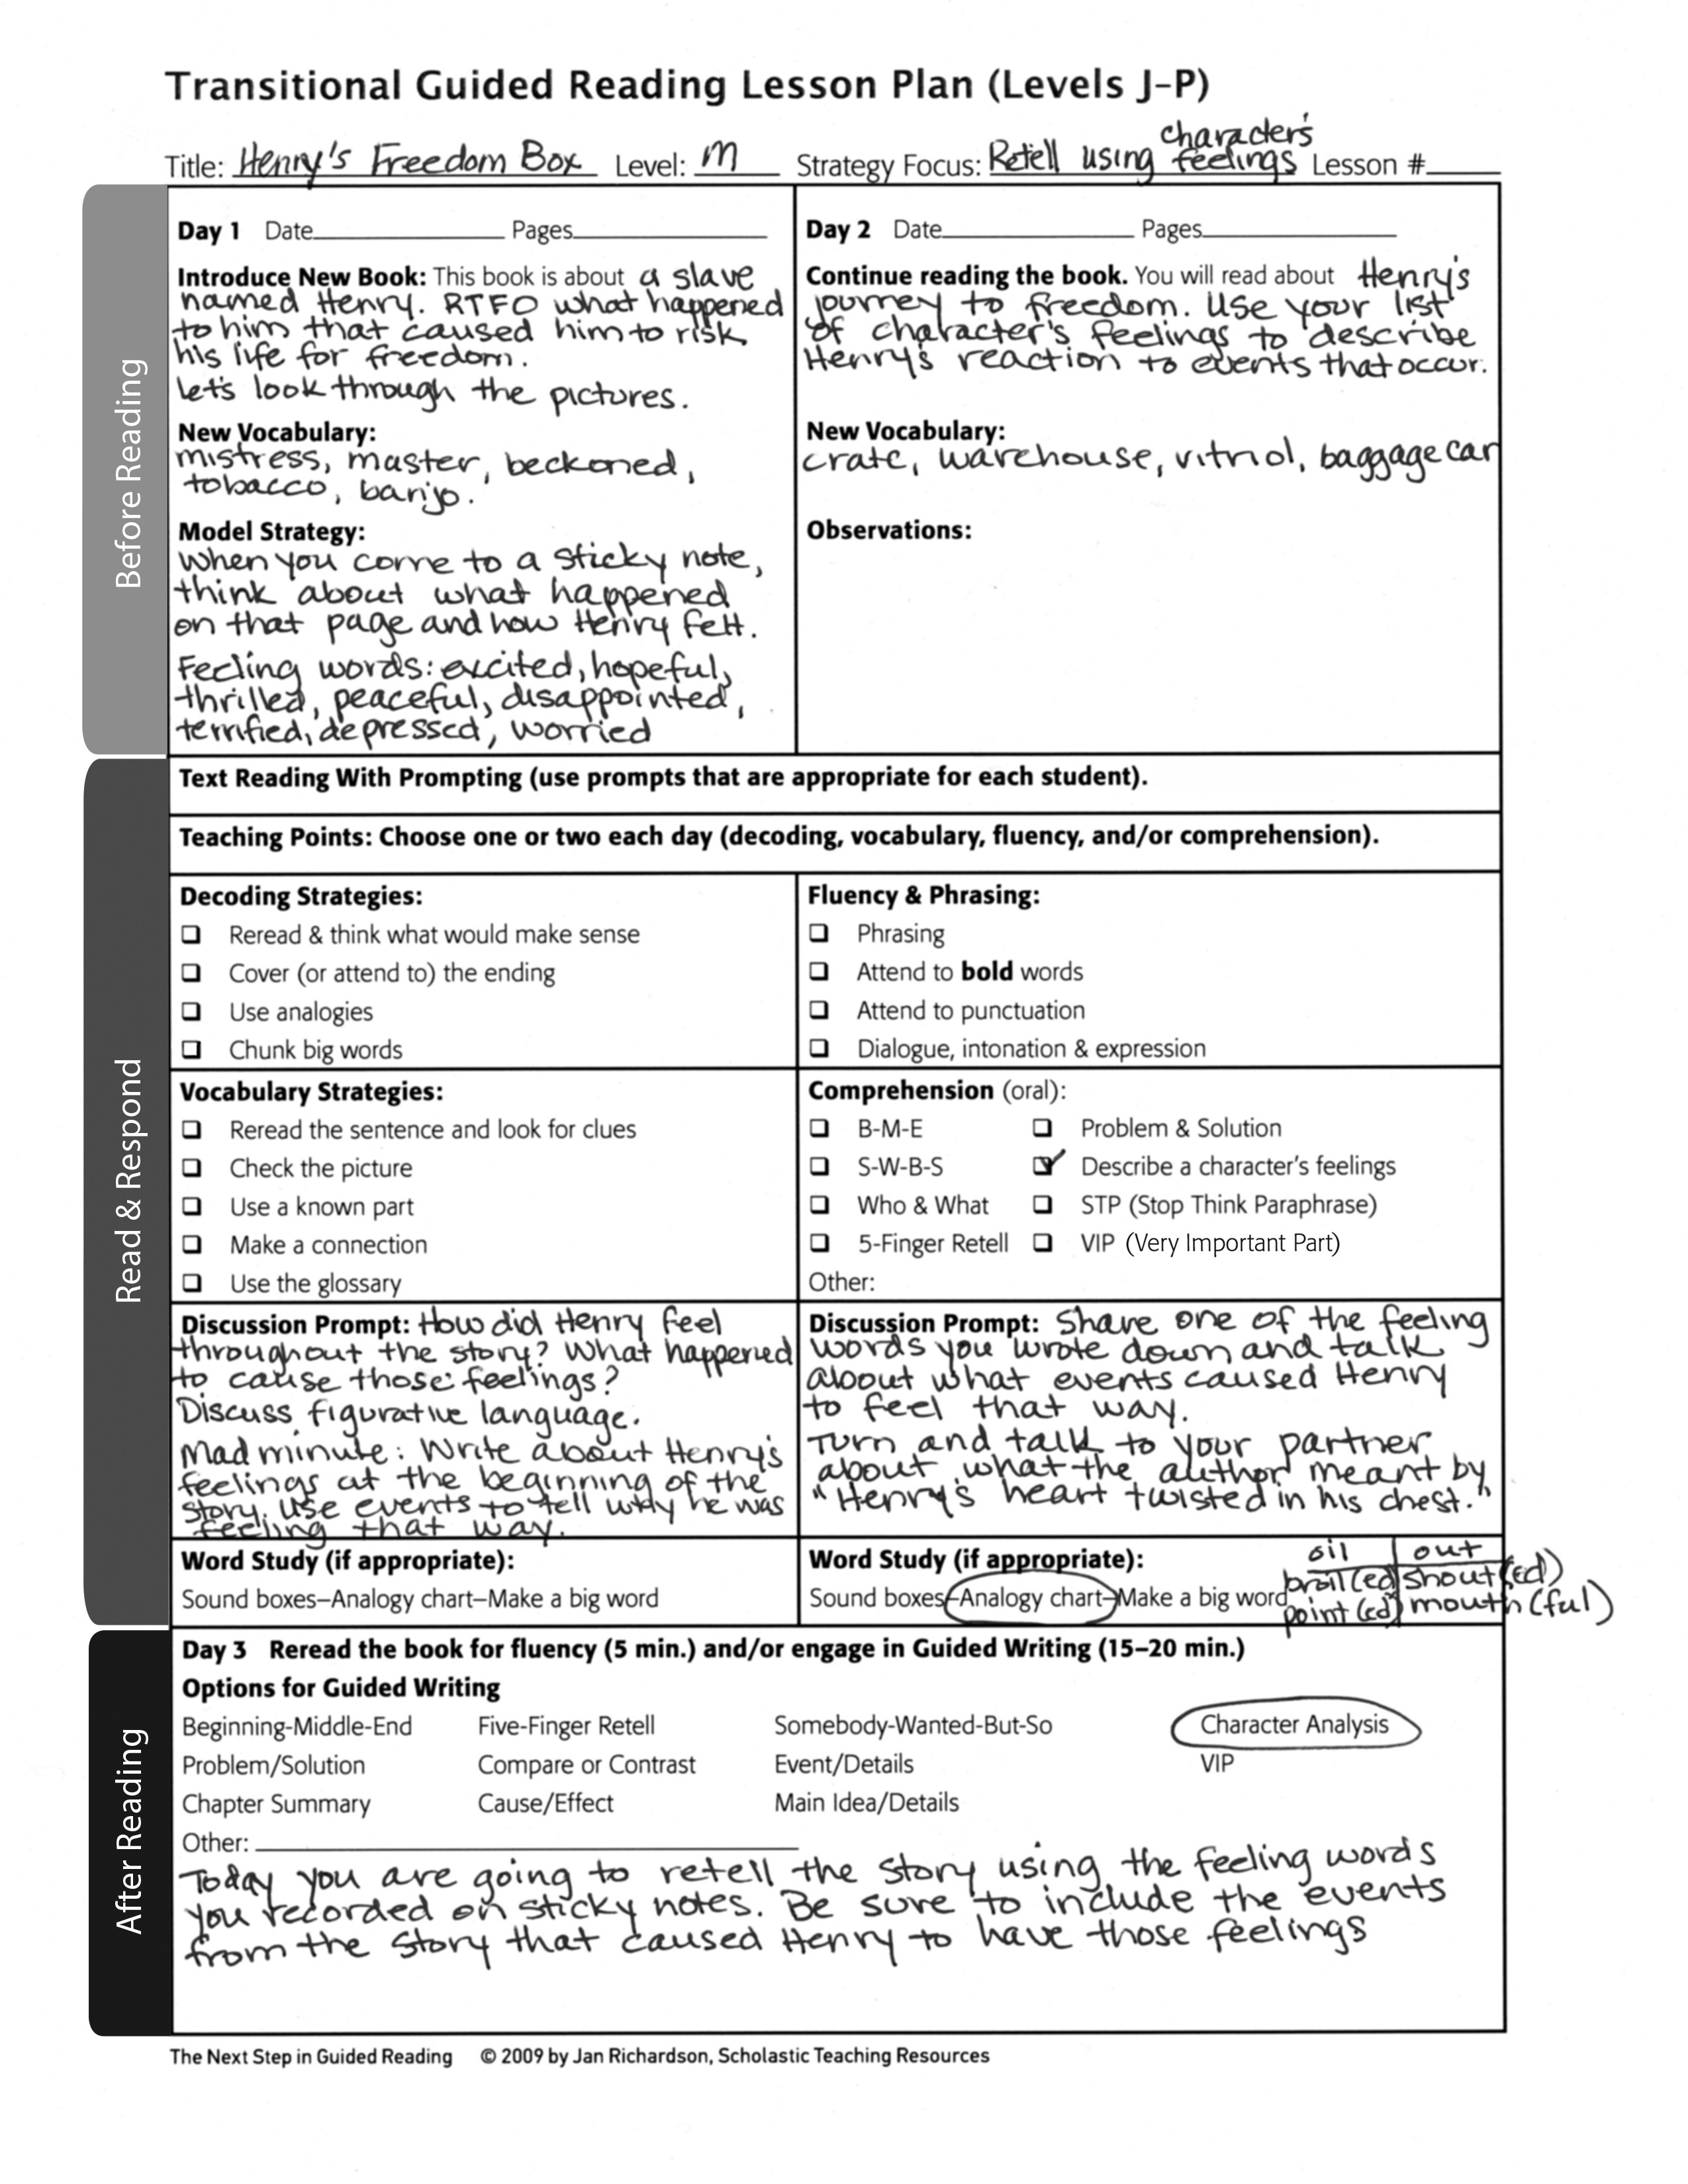 003 William Faulkner Essays Essay Example Bank Comparison Worksheet Fresh Model English Stunning Topics Full